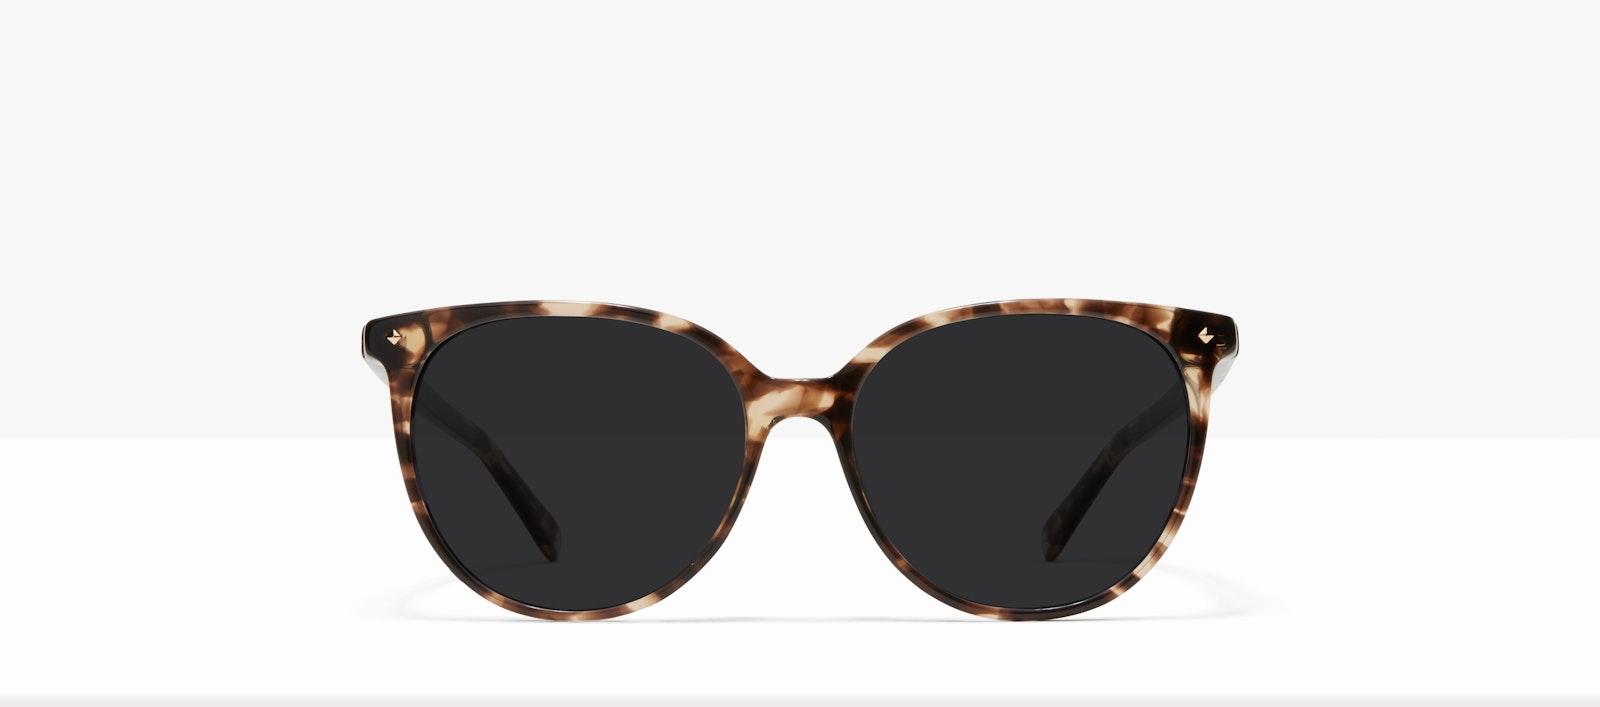 Affordable Fashion Glasses Round Sunglasses Women Area L Leopard Front